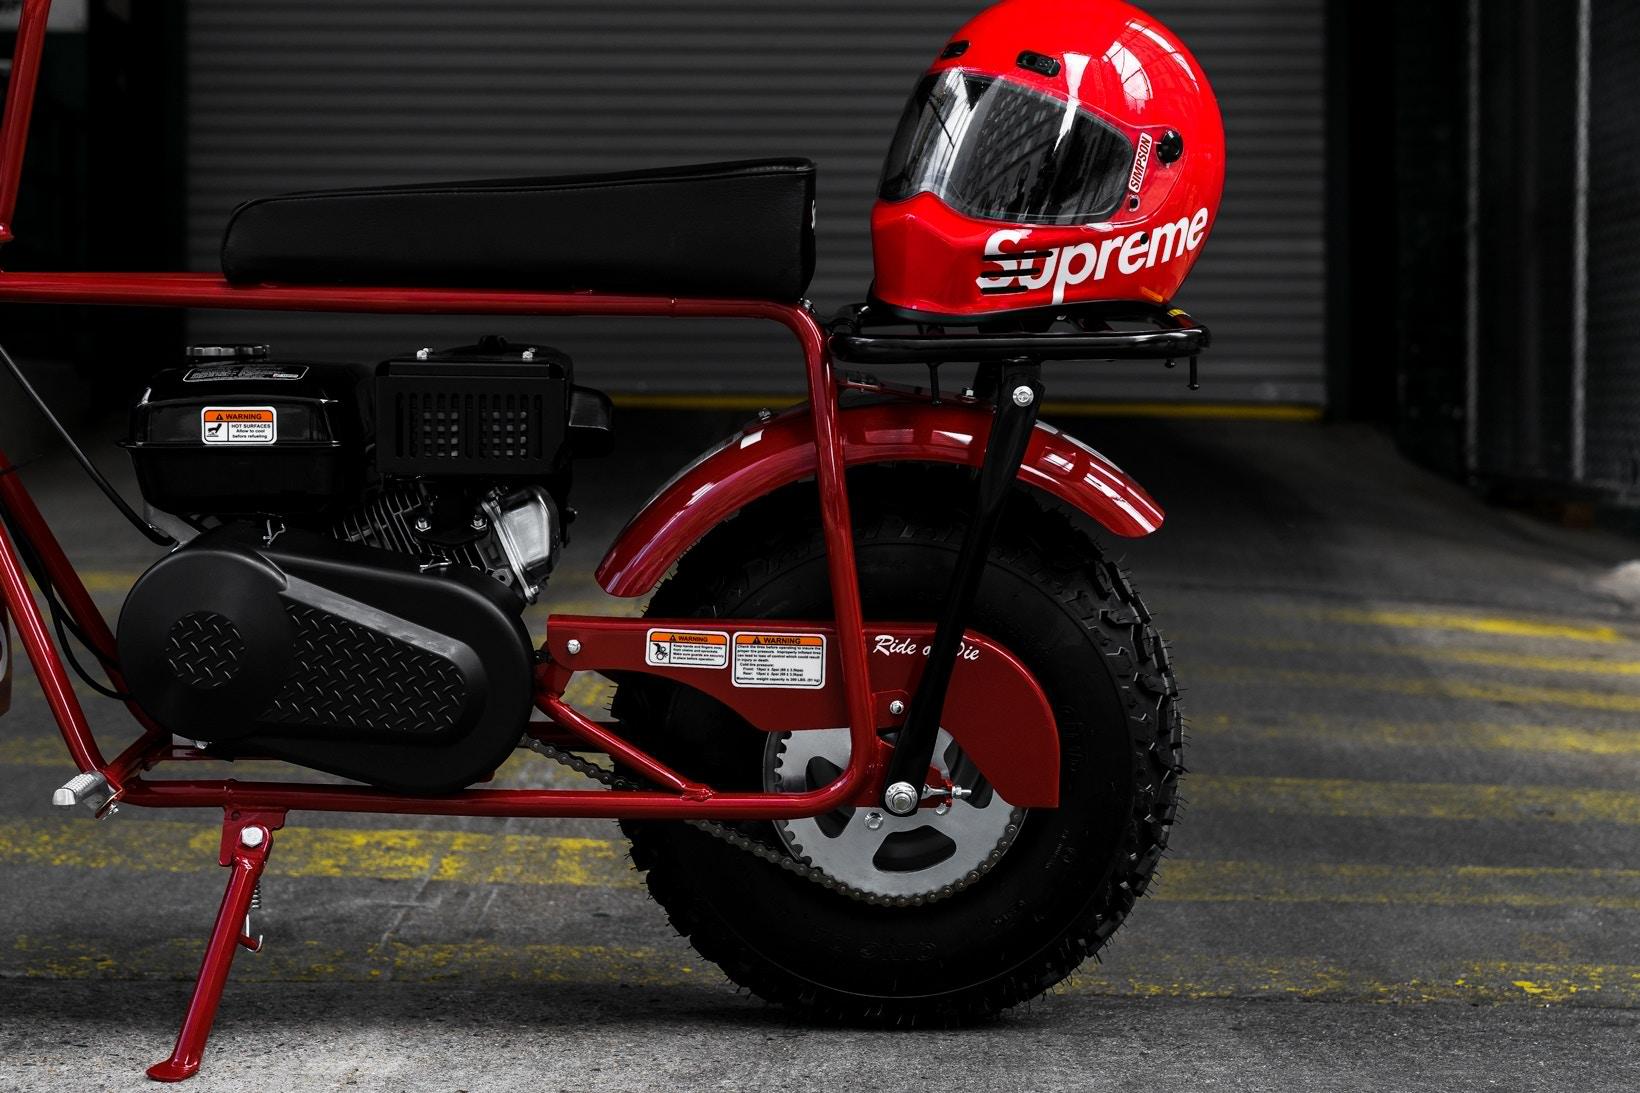 supreme coleman ct200u minibike 06 - Supreme lança oficialmente minimoto com a Coleman